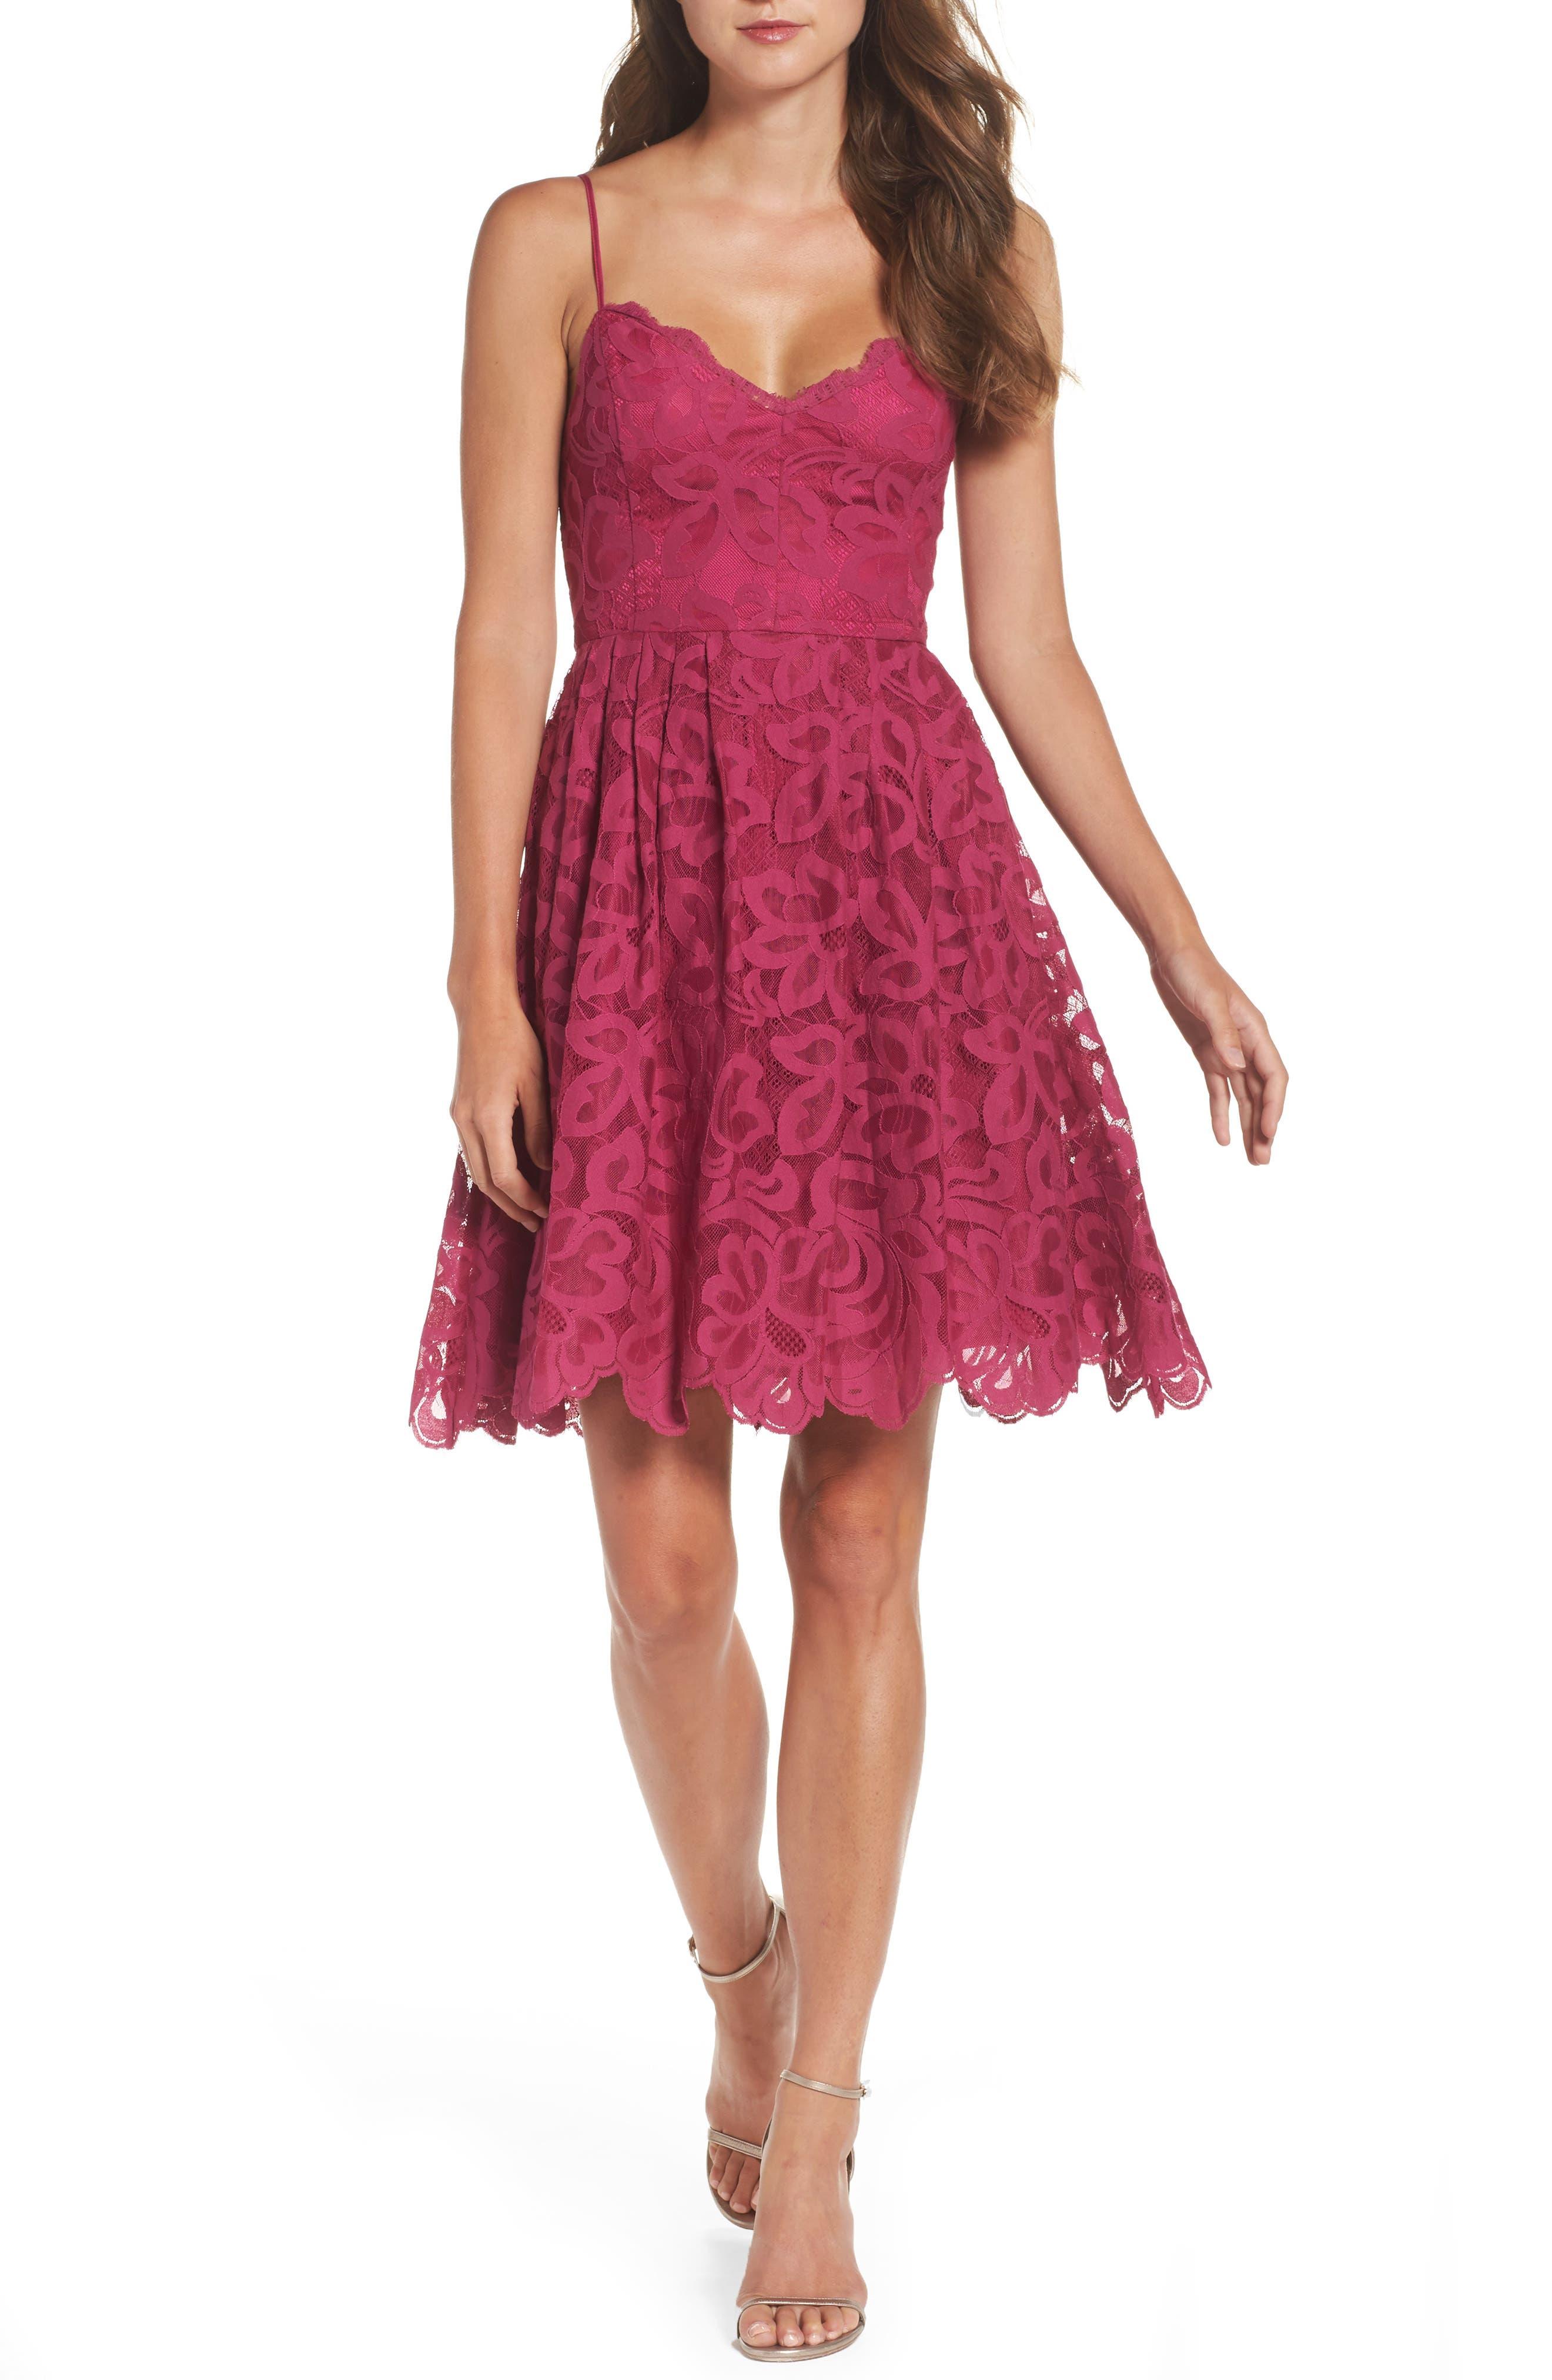 Celeste Scalloped Lace Fit & Flare Dress,                         Main,                         color, Raspberry Sorbet